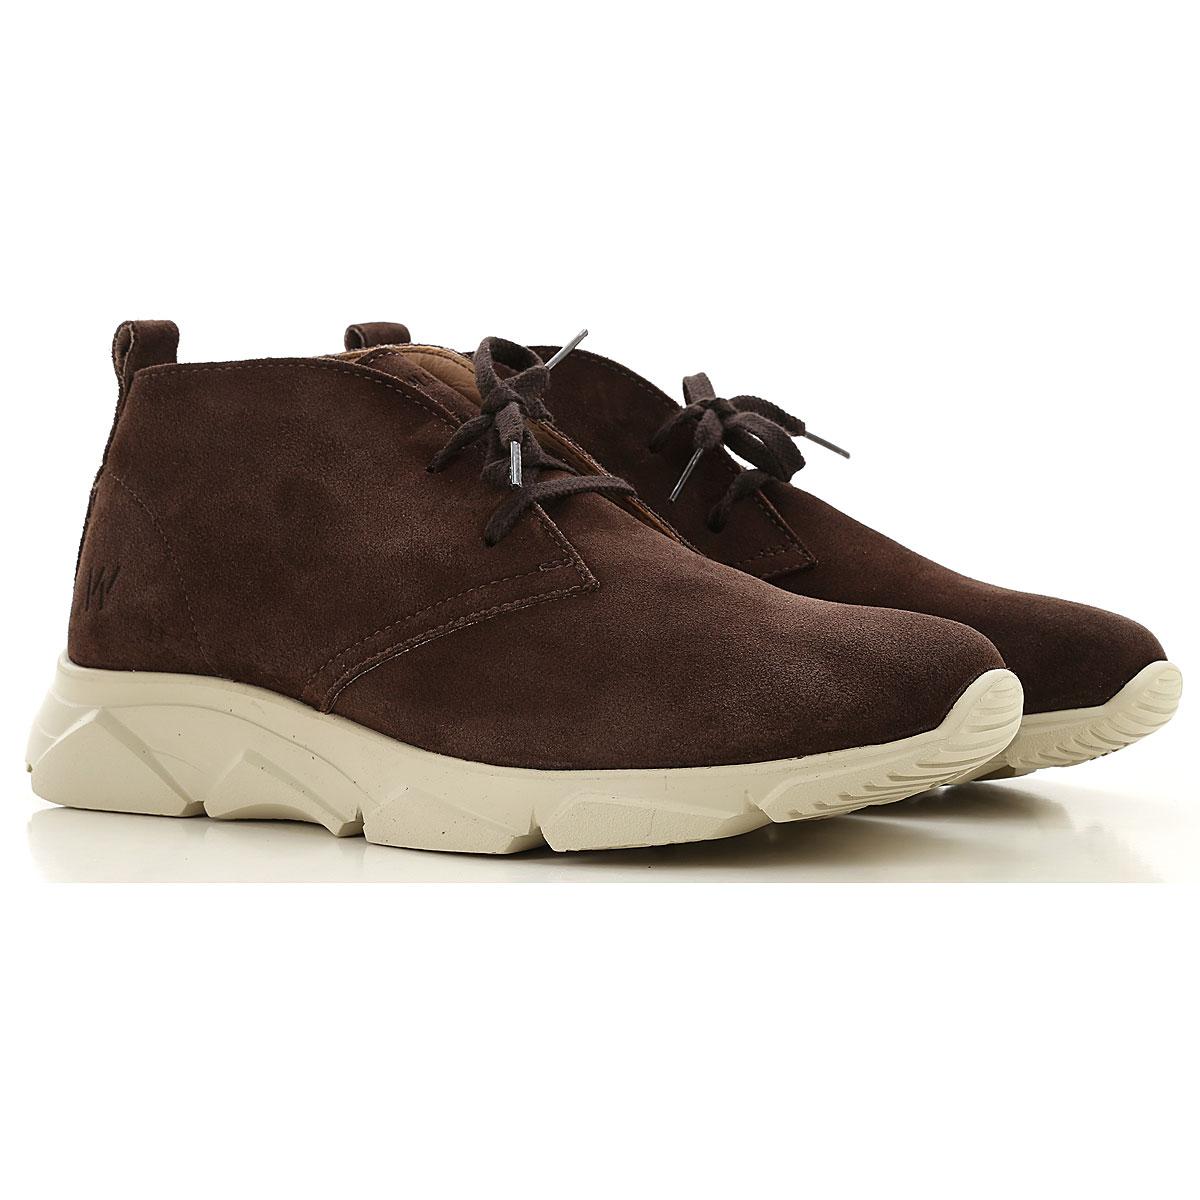 Wally Walker Desert Boots Chukka for Men On Sale, Dark Chestnut, Suede leather, 2019, 10 7.5